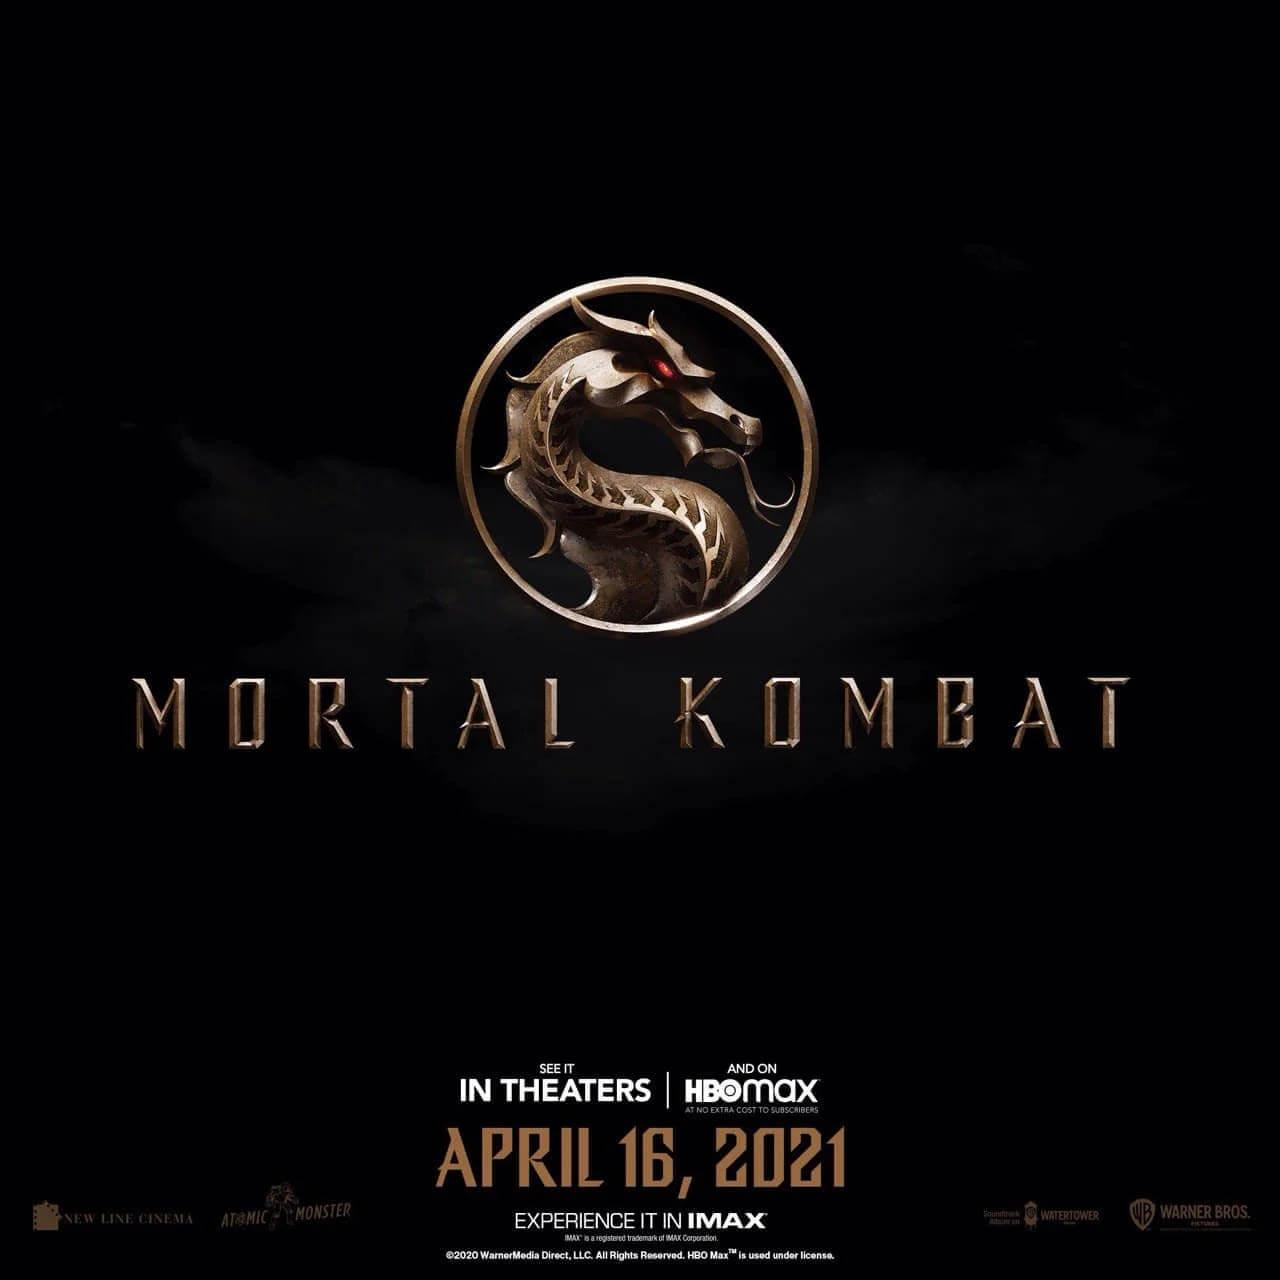 تاریخ اکران Mortal kombat